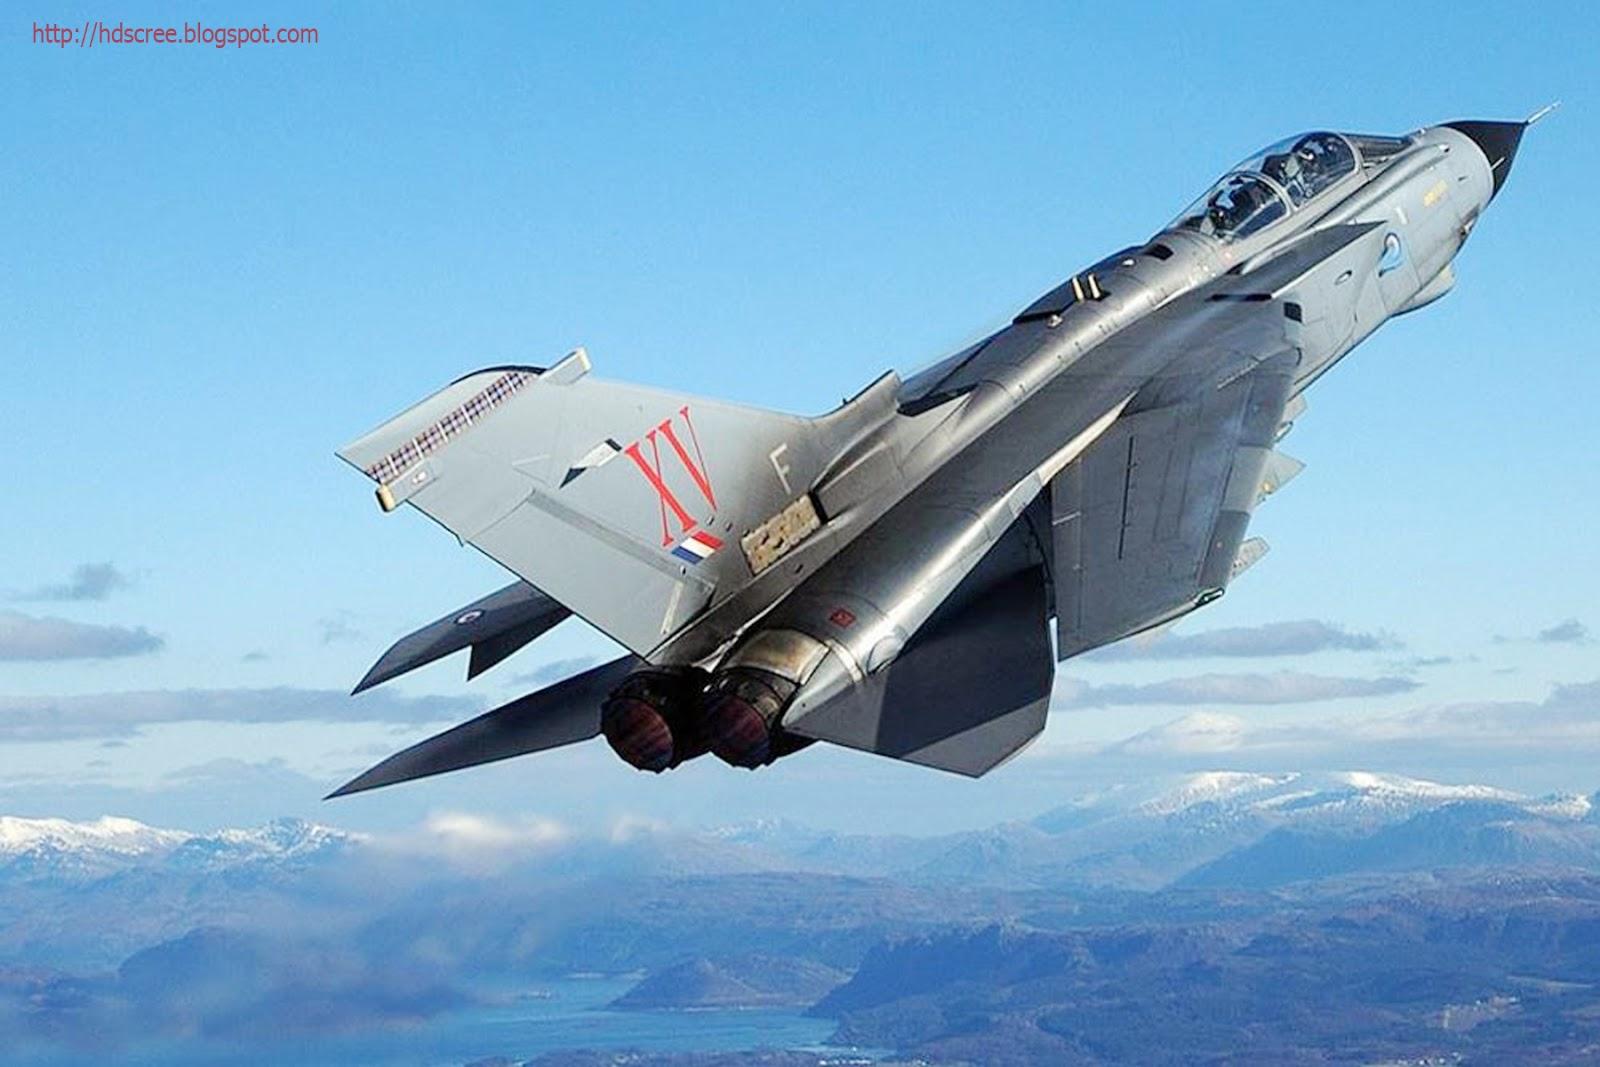 HD Wallpaper Of Fighter Aircraft HD Wallpaper HD Screensaver HD 1600x1067